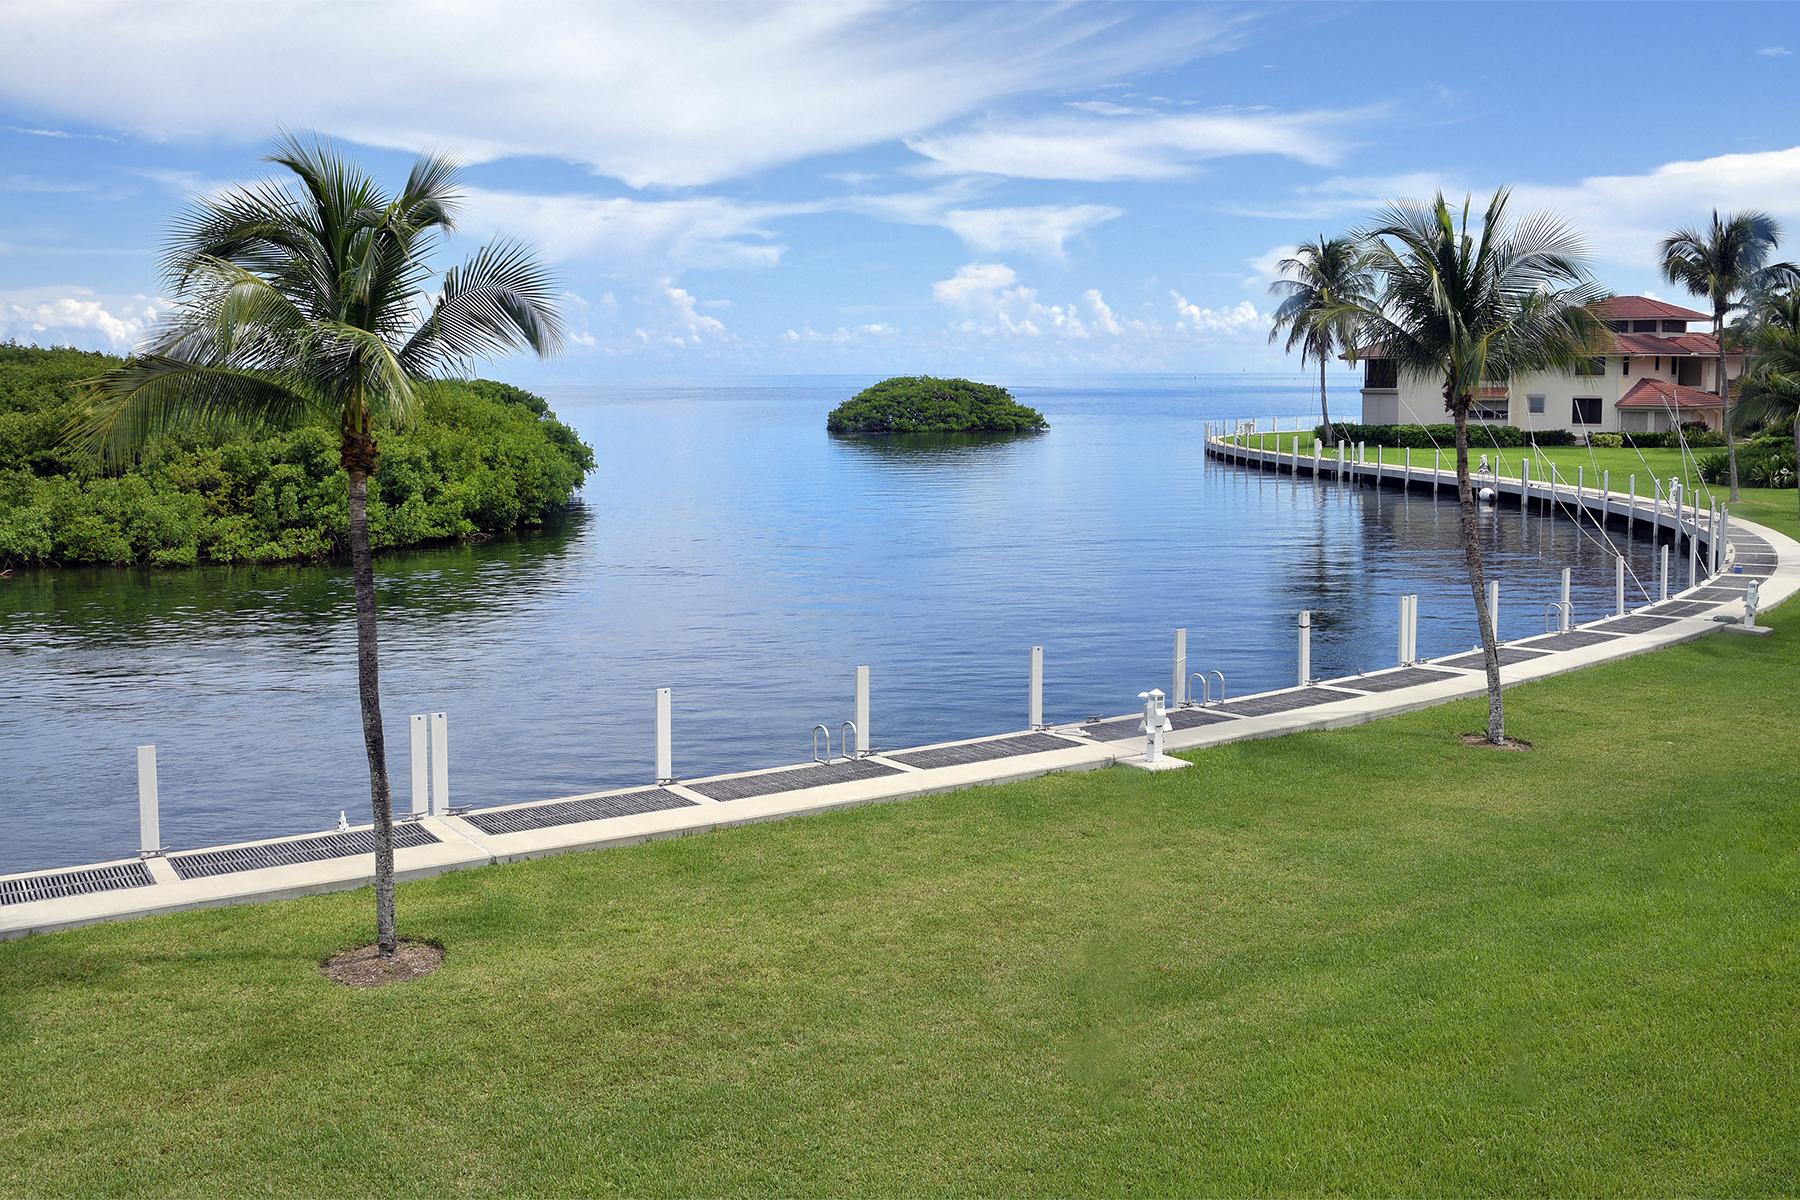 Nhà chung cư vì Bán tại Waterfront Condominium at Ocean Reef 43 Pumpkin Cay Rd., Unit B Ocean Reef Community, Key Largo, Florida, 33037 Hoa Kỳ